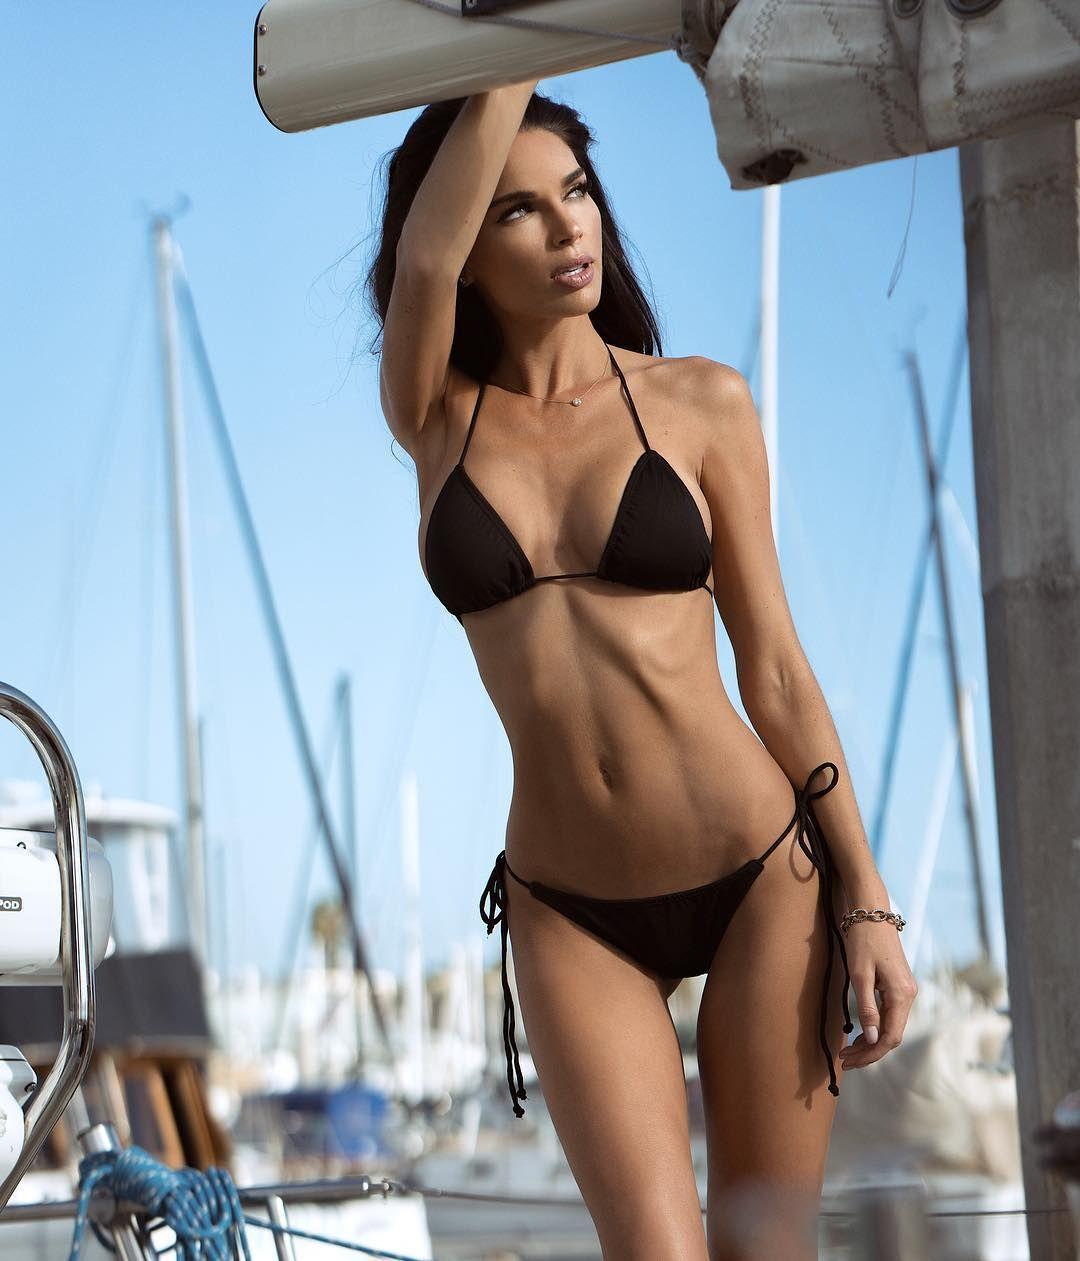 most beautiful bikini models